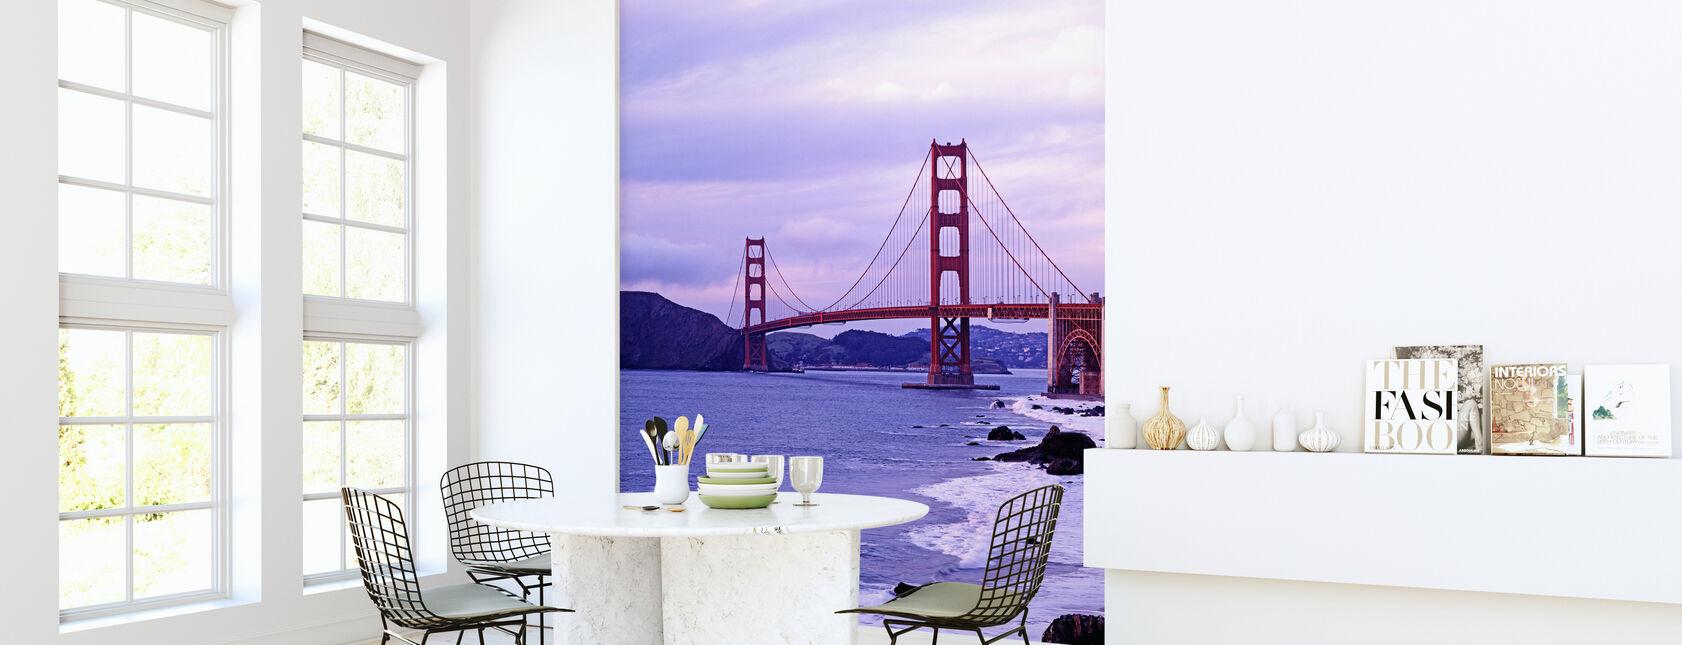 Bay Bridge in Purple Haze - Wallpaper - Kitchen